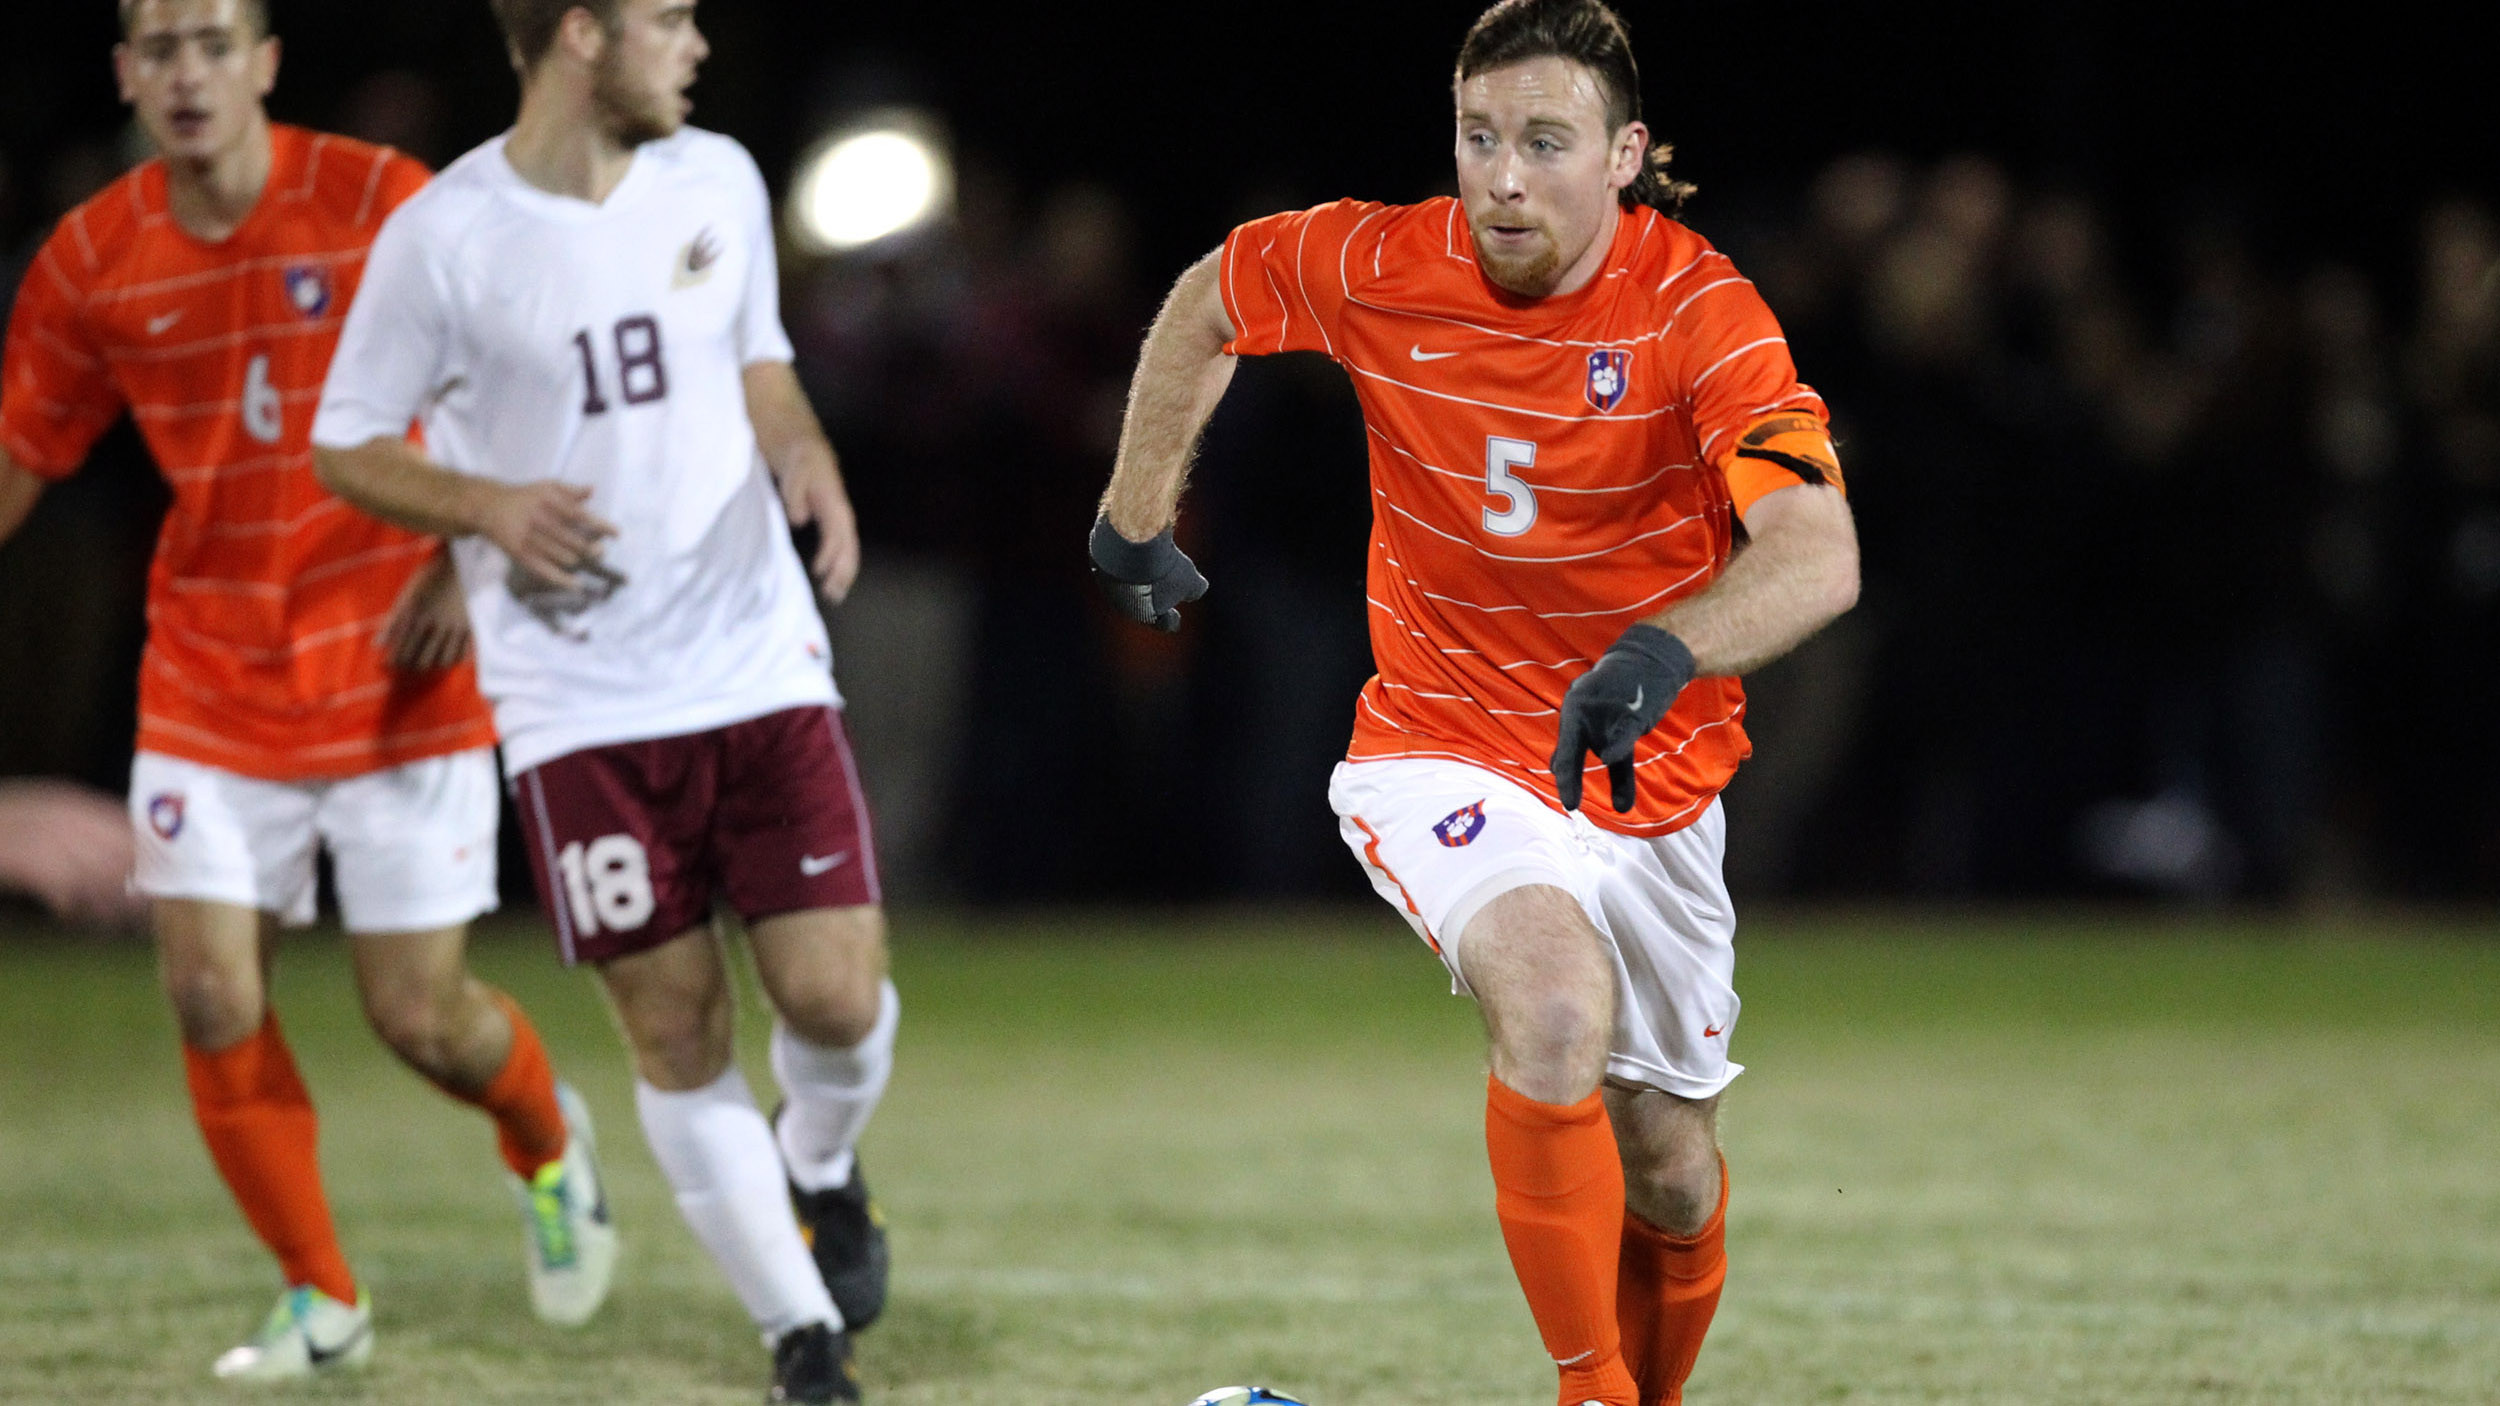 EXCLUSIVE: Special Season Ends in Heartbreak for Men's Soccer Team